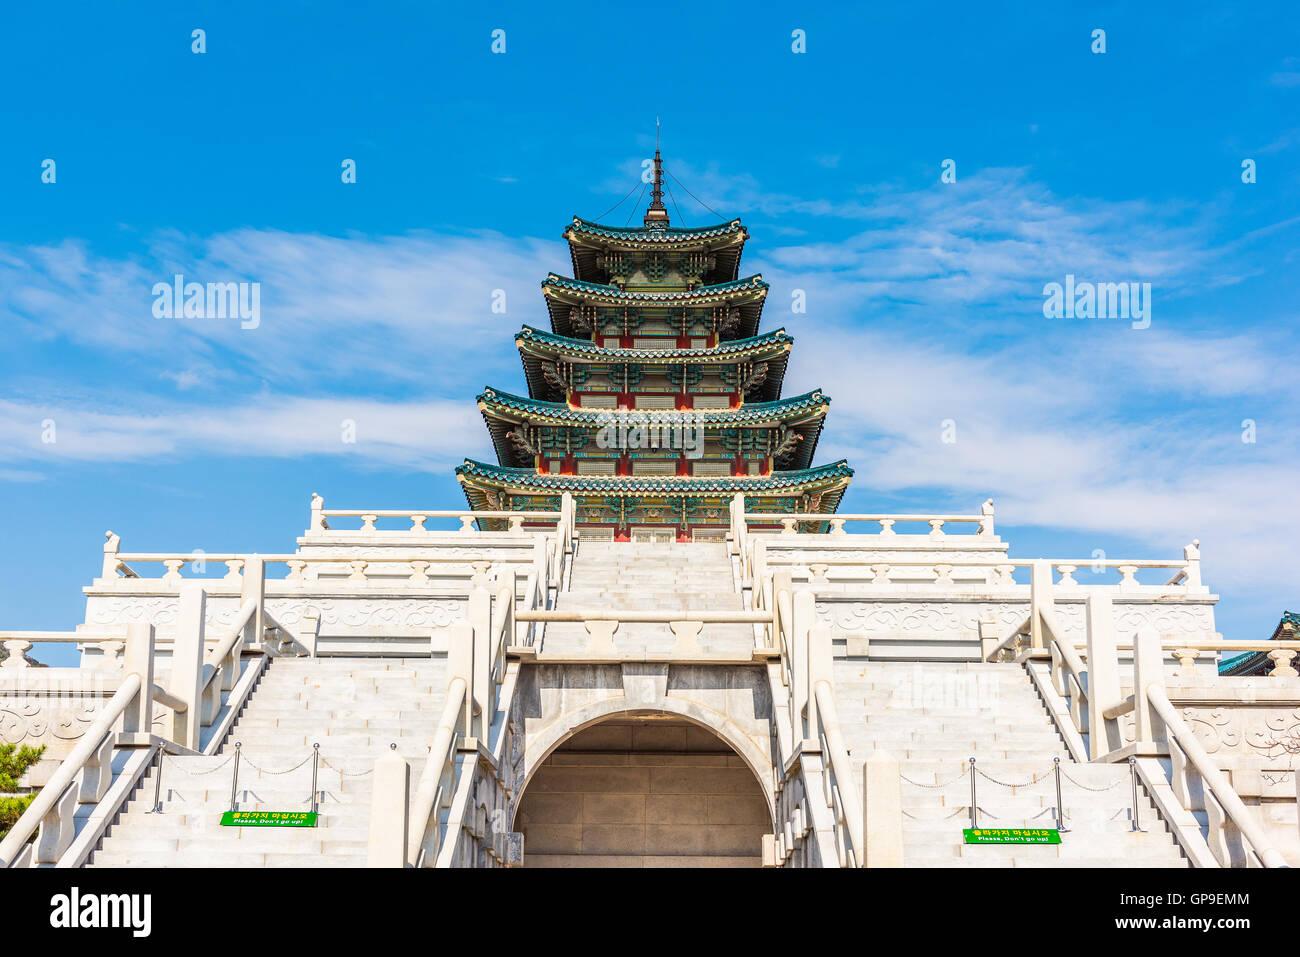 Gyeongbokgung Palace in Seoul ,Korea. - Stock Image